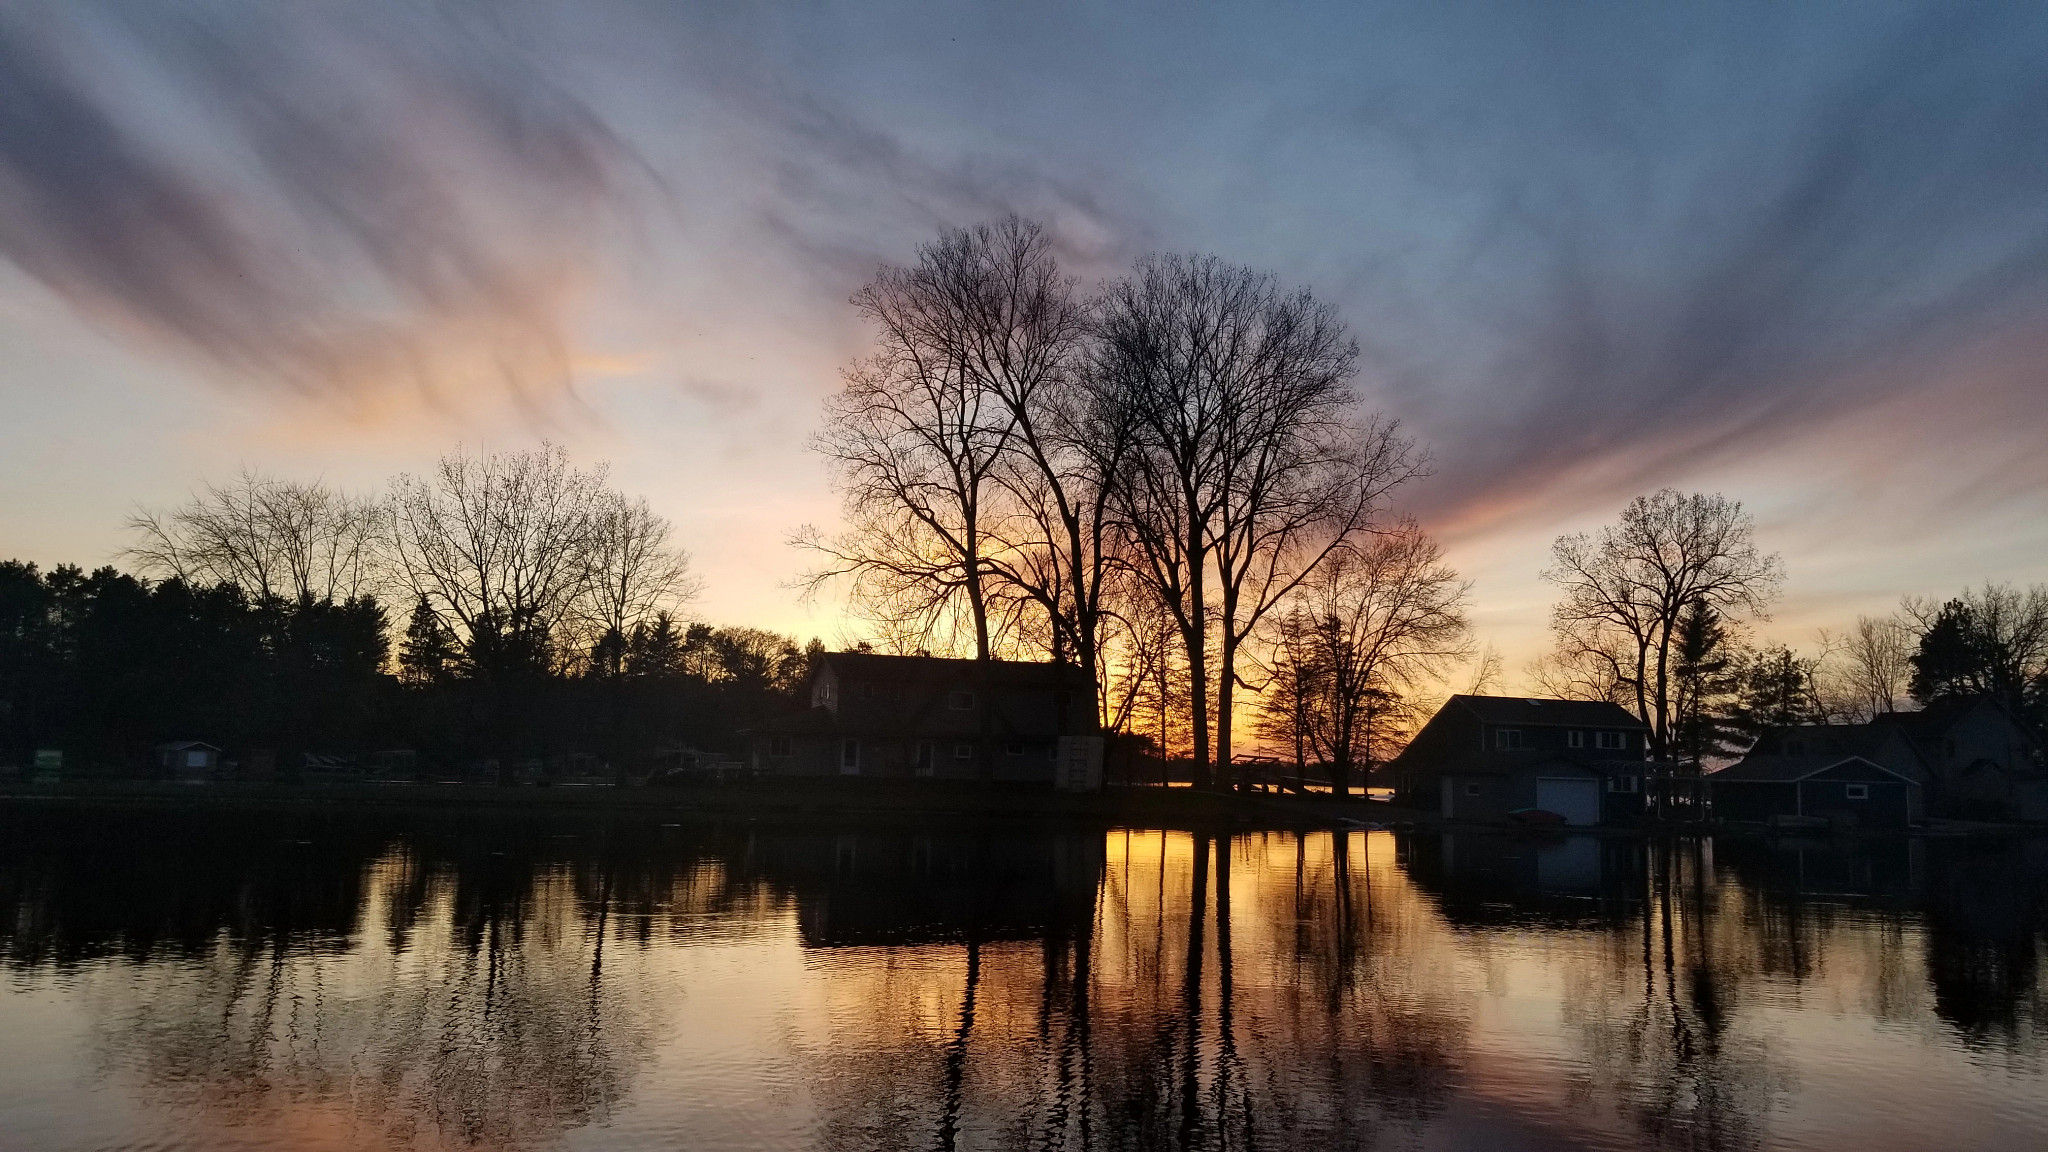 sunset over a calm lake